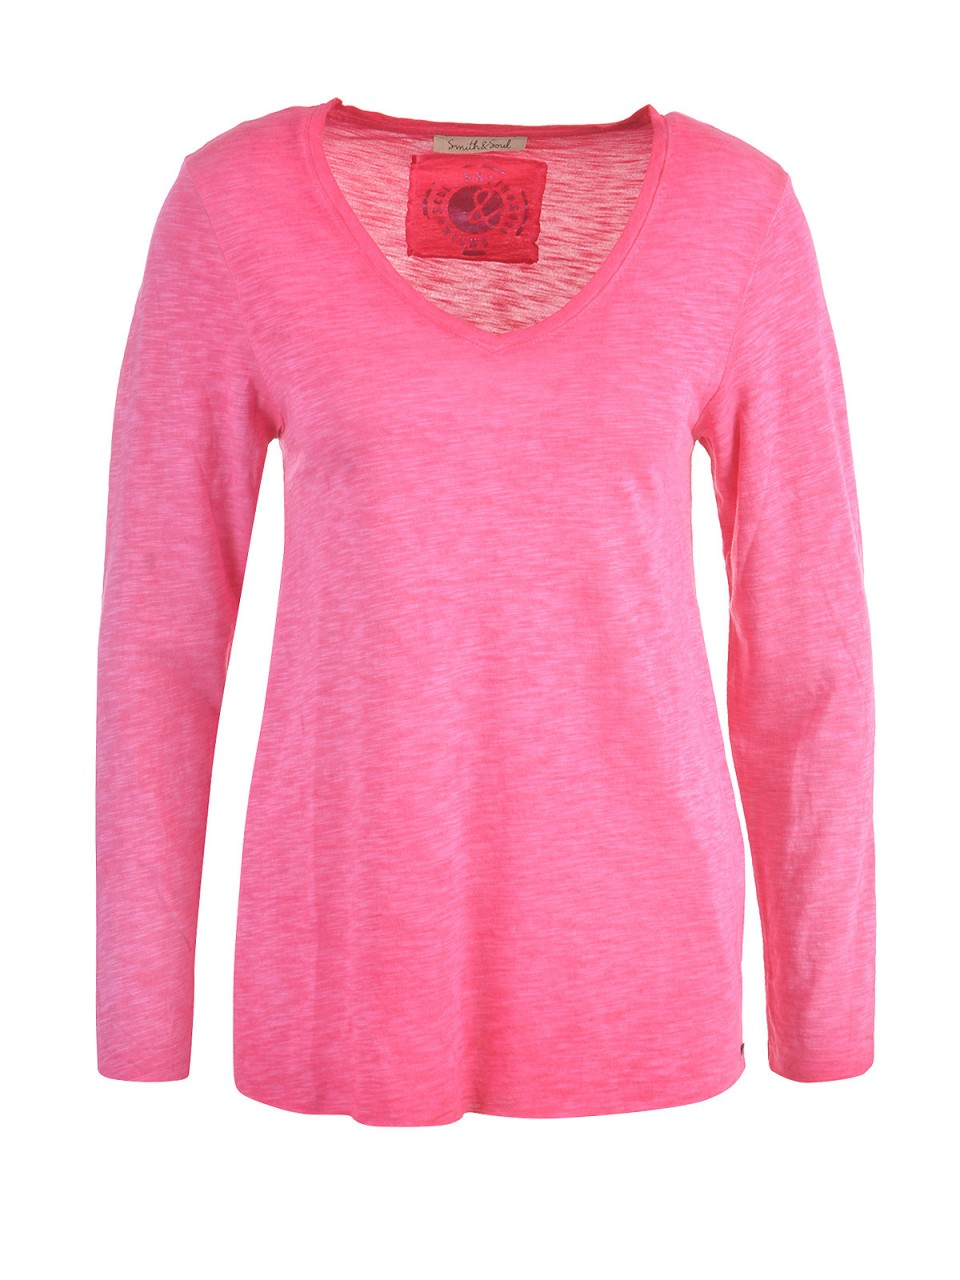 Oberteile - SMITH SOUL Damen Shirt, pink  - Onlineshop Designermode.com